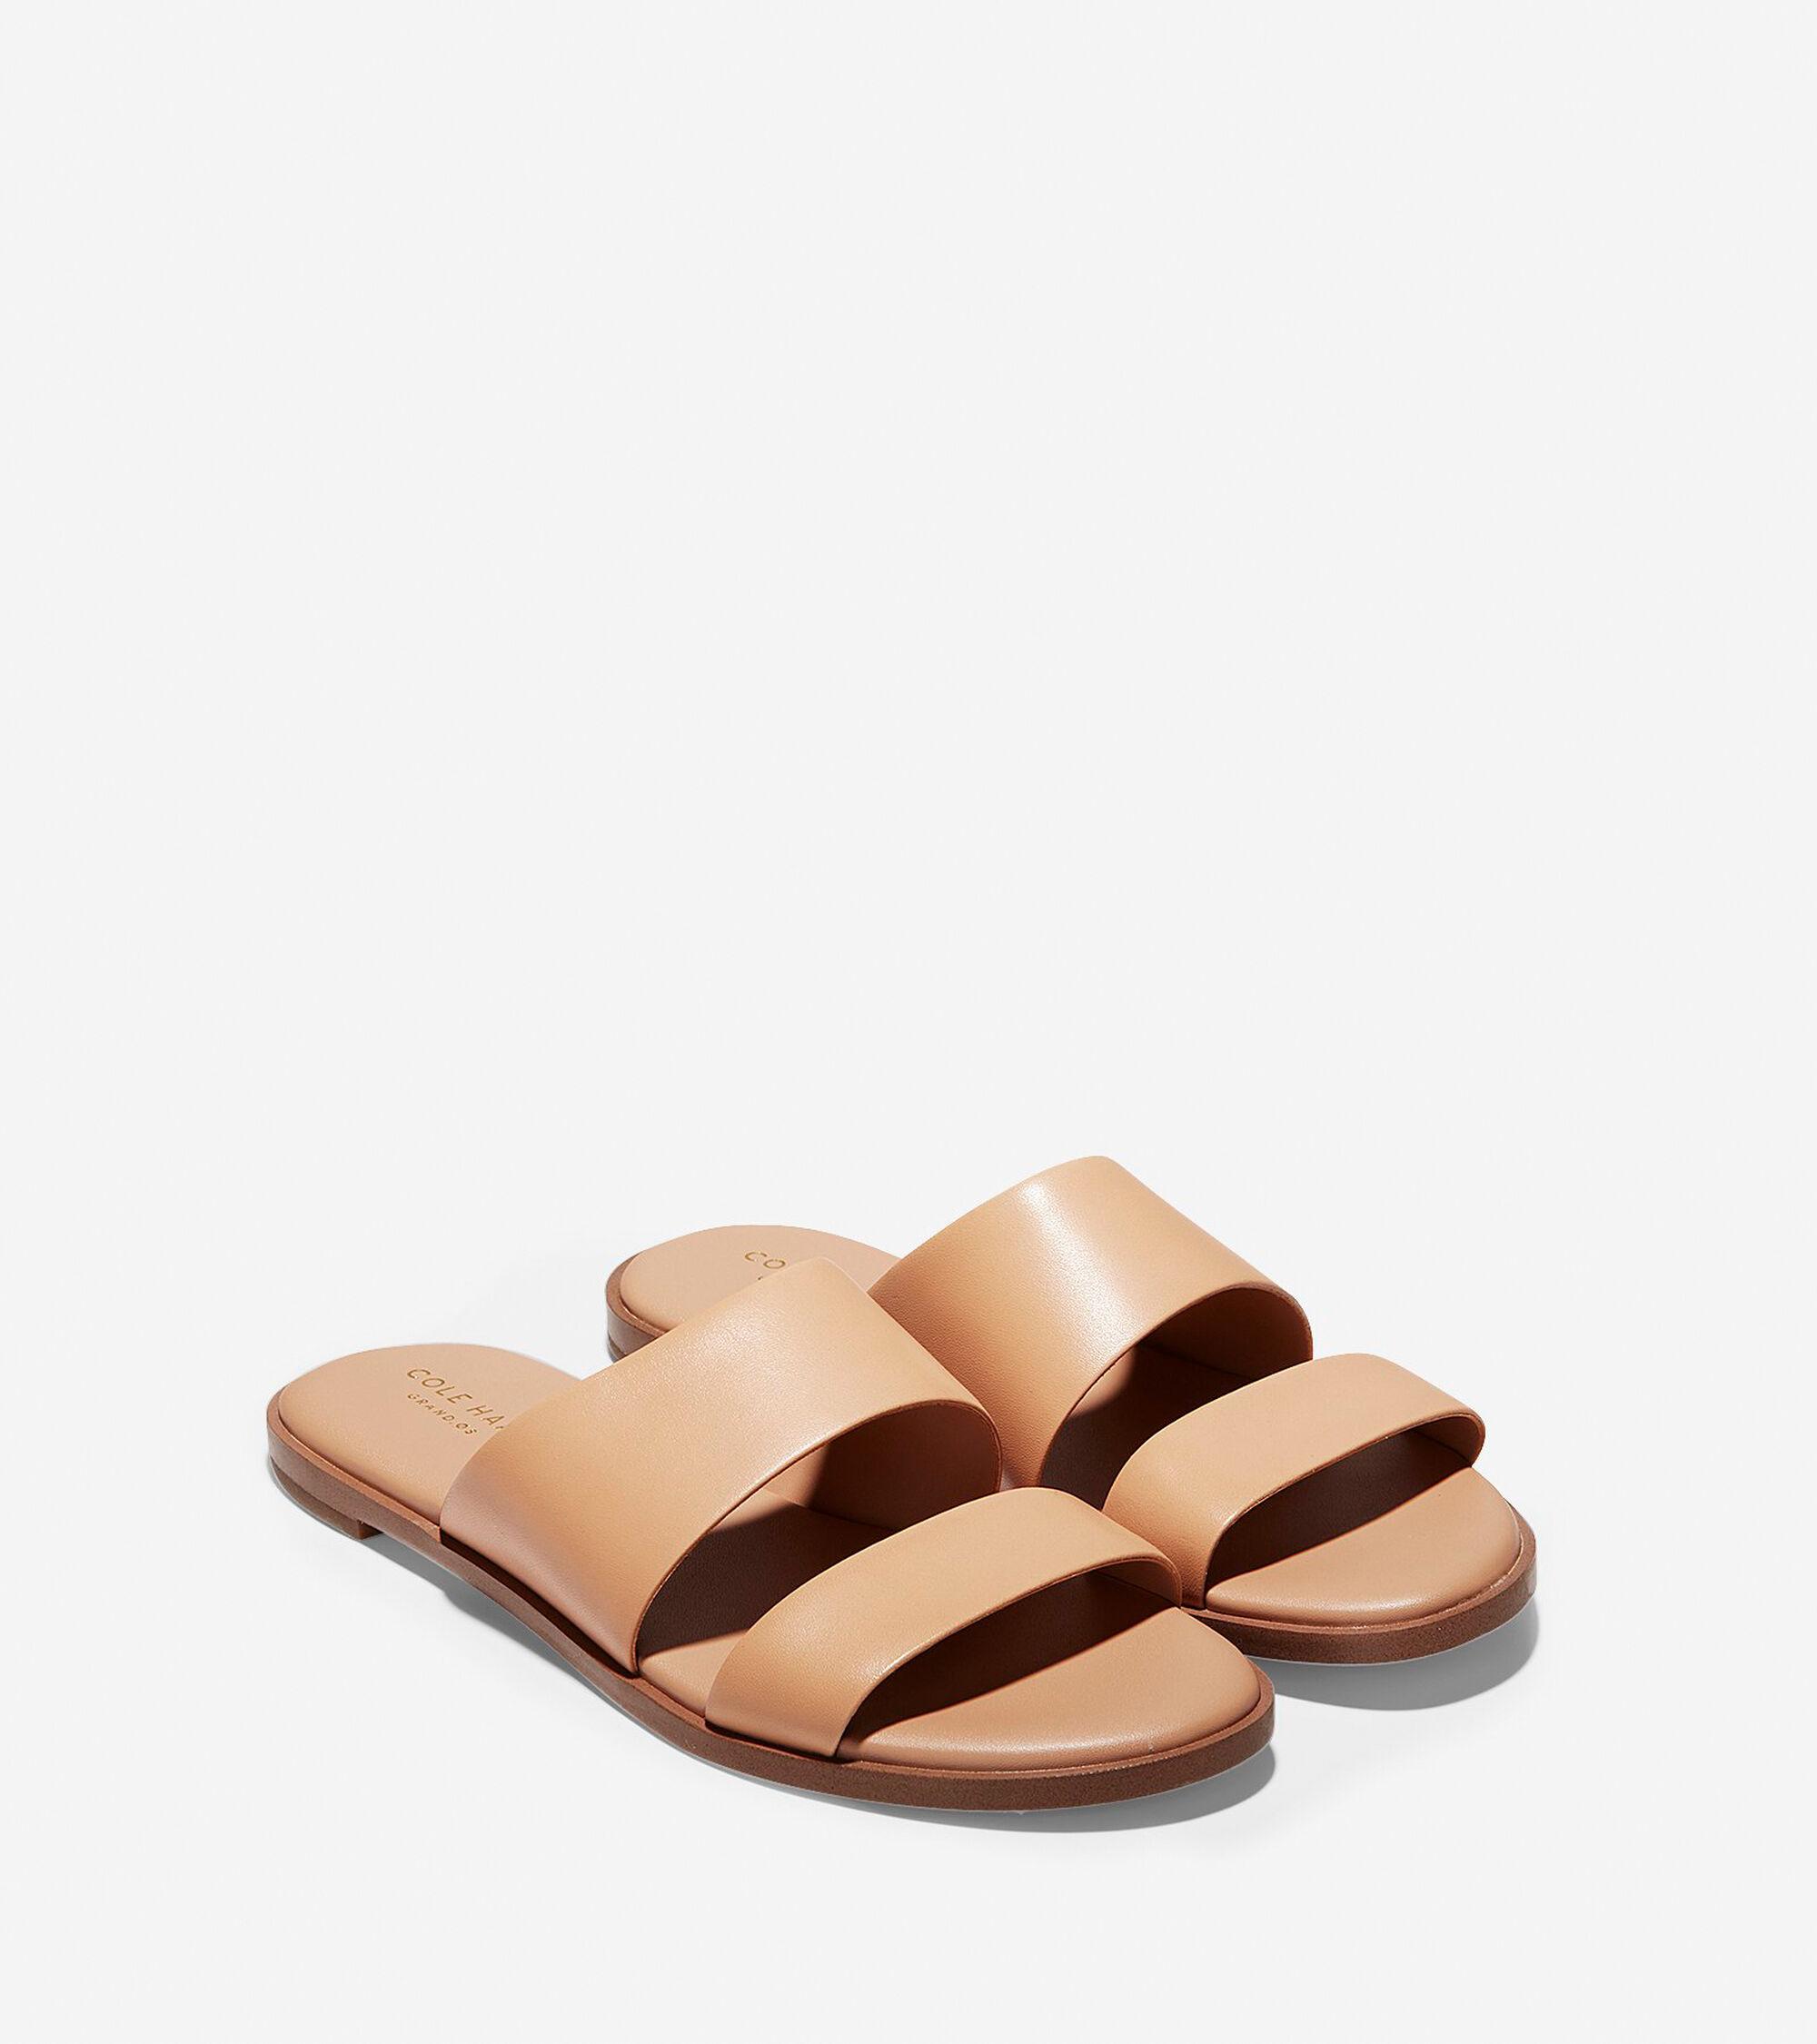 eff6e05218d7 ... Anica Slide Sandal · Anica Slide Sandal.  COLEHAAN